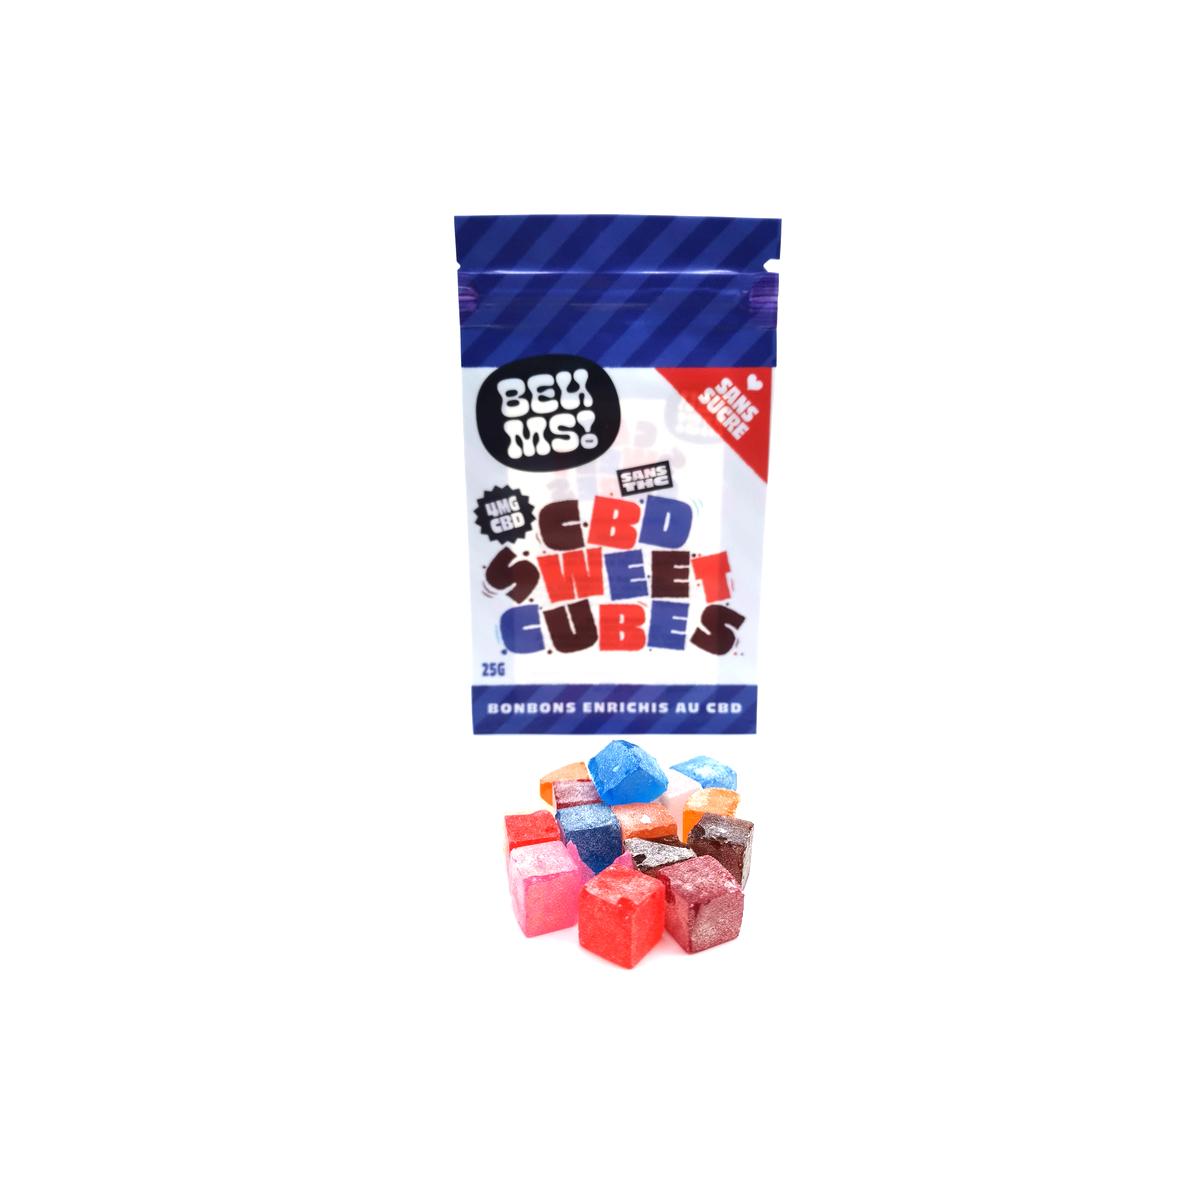 ligne verte visuels cubes